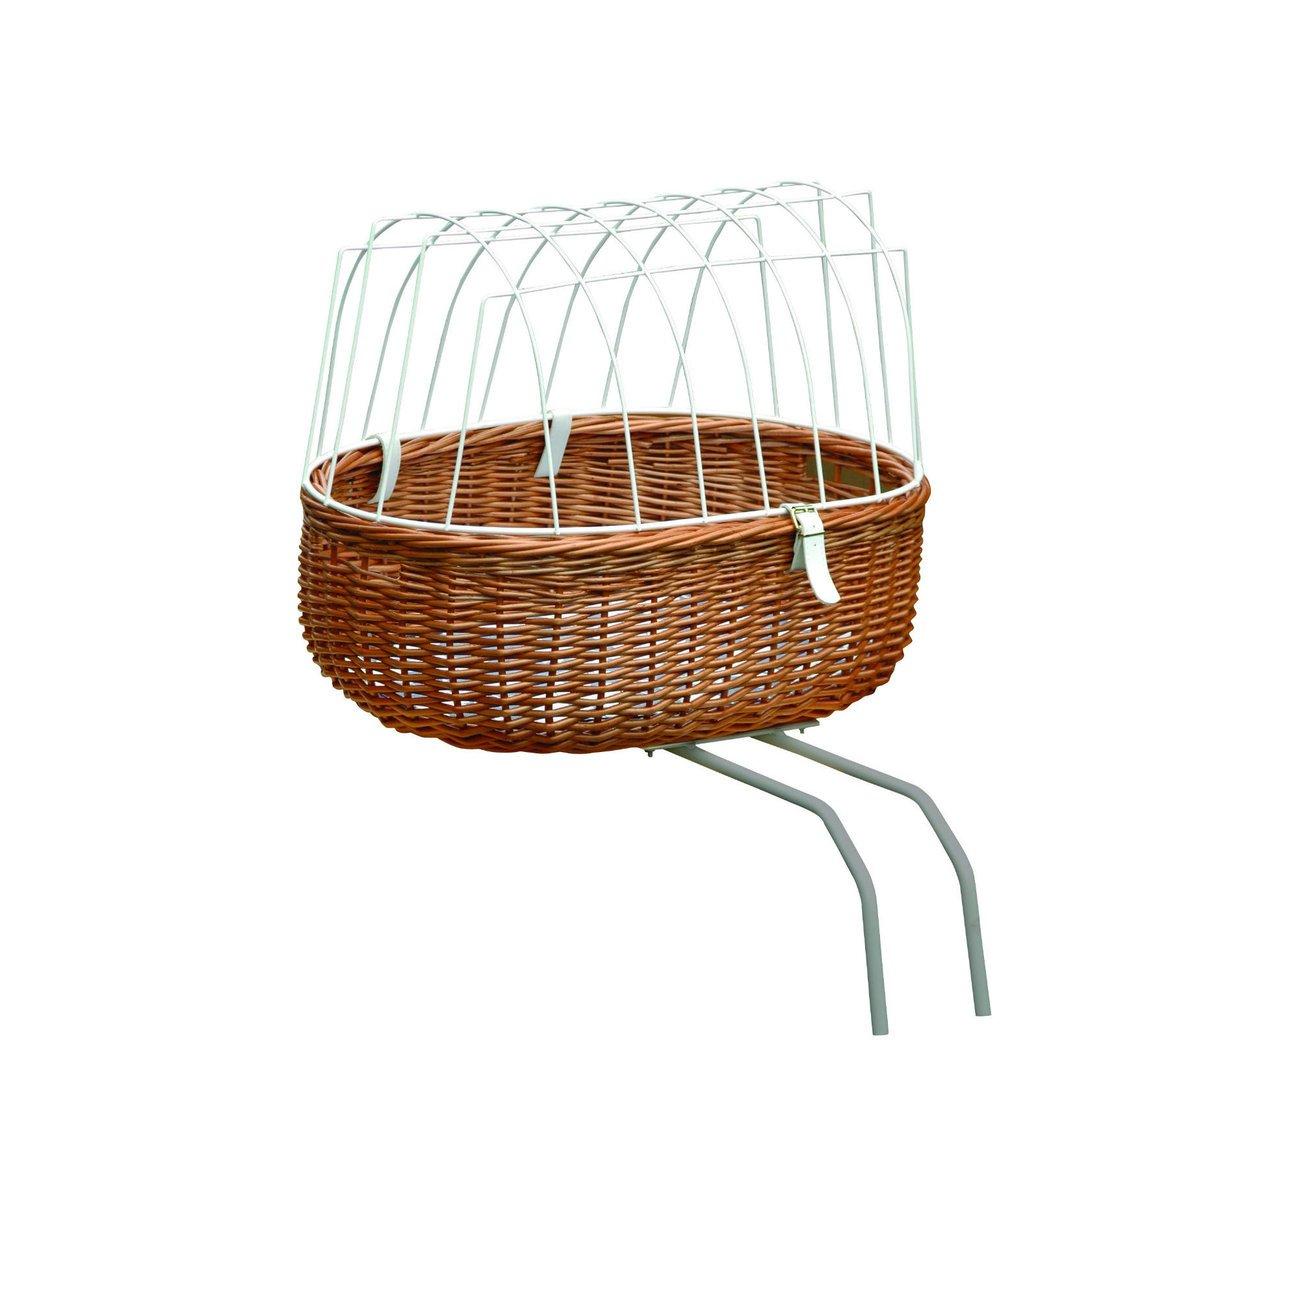 Aumüller Fahrradkorb für Hunde Rahmenmontage hinten, Bild 8